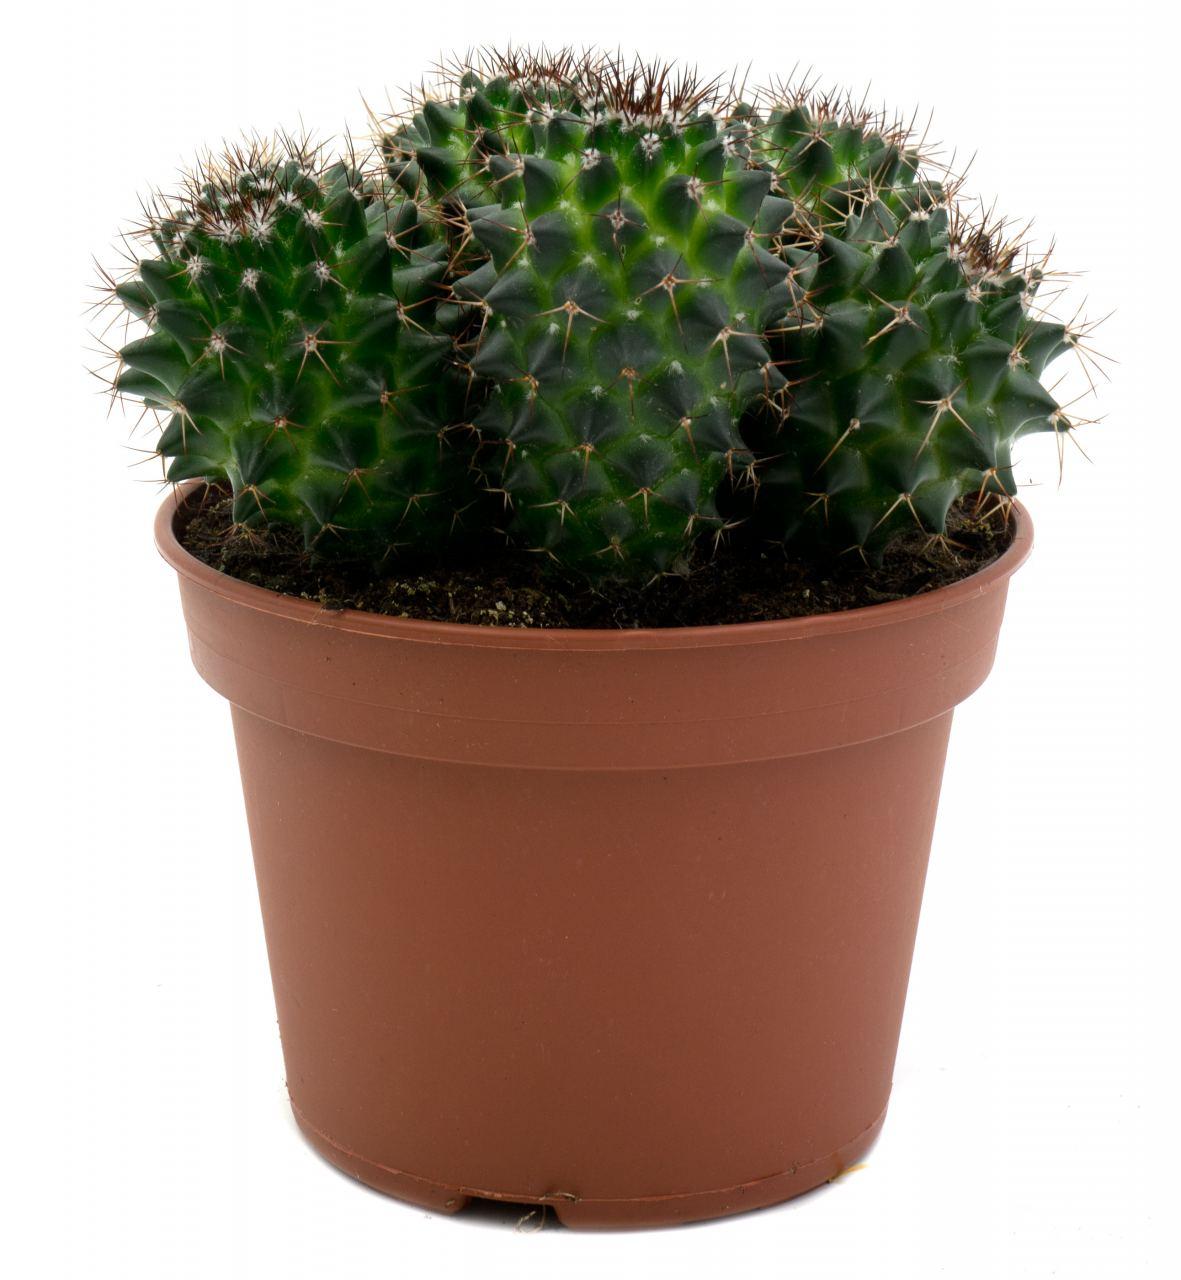 Kaktus #7